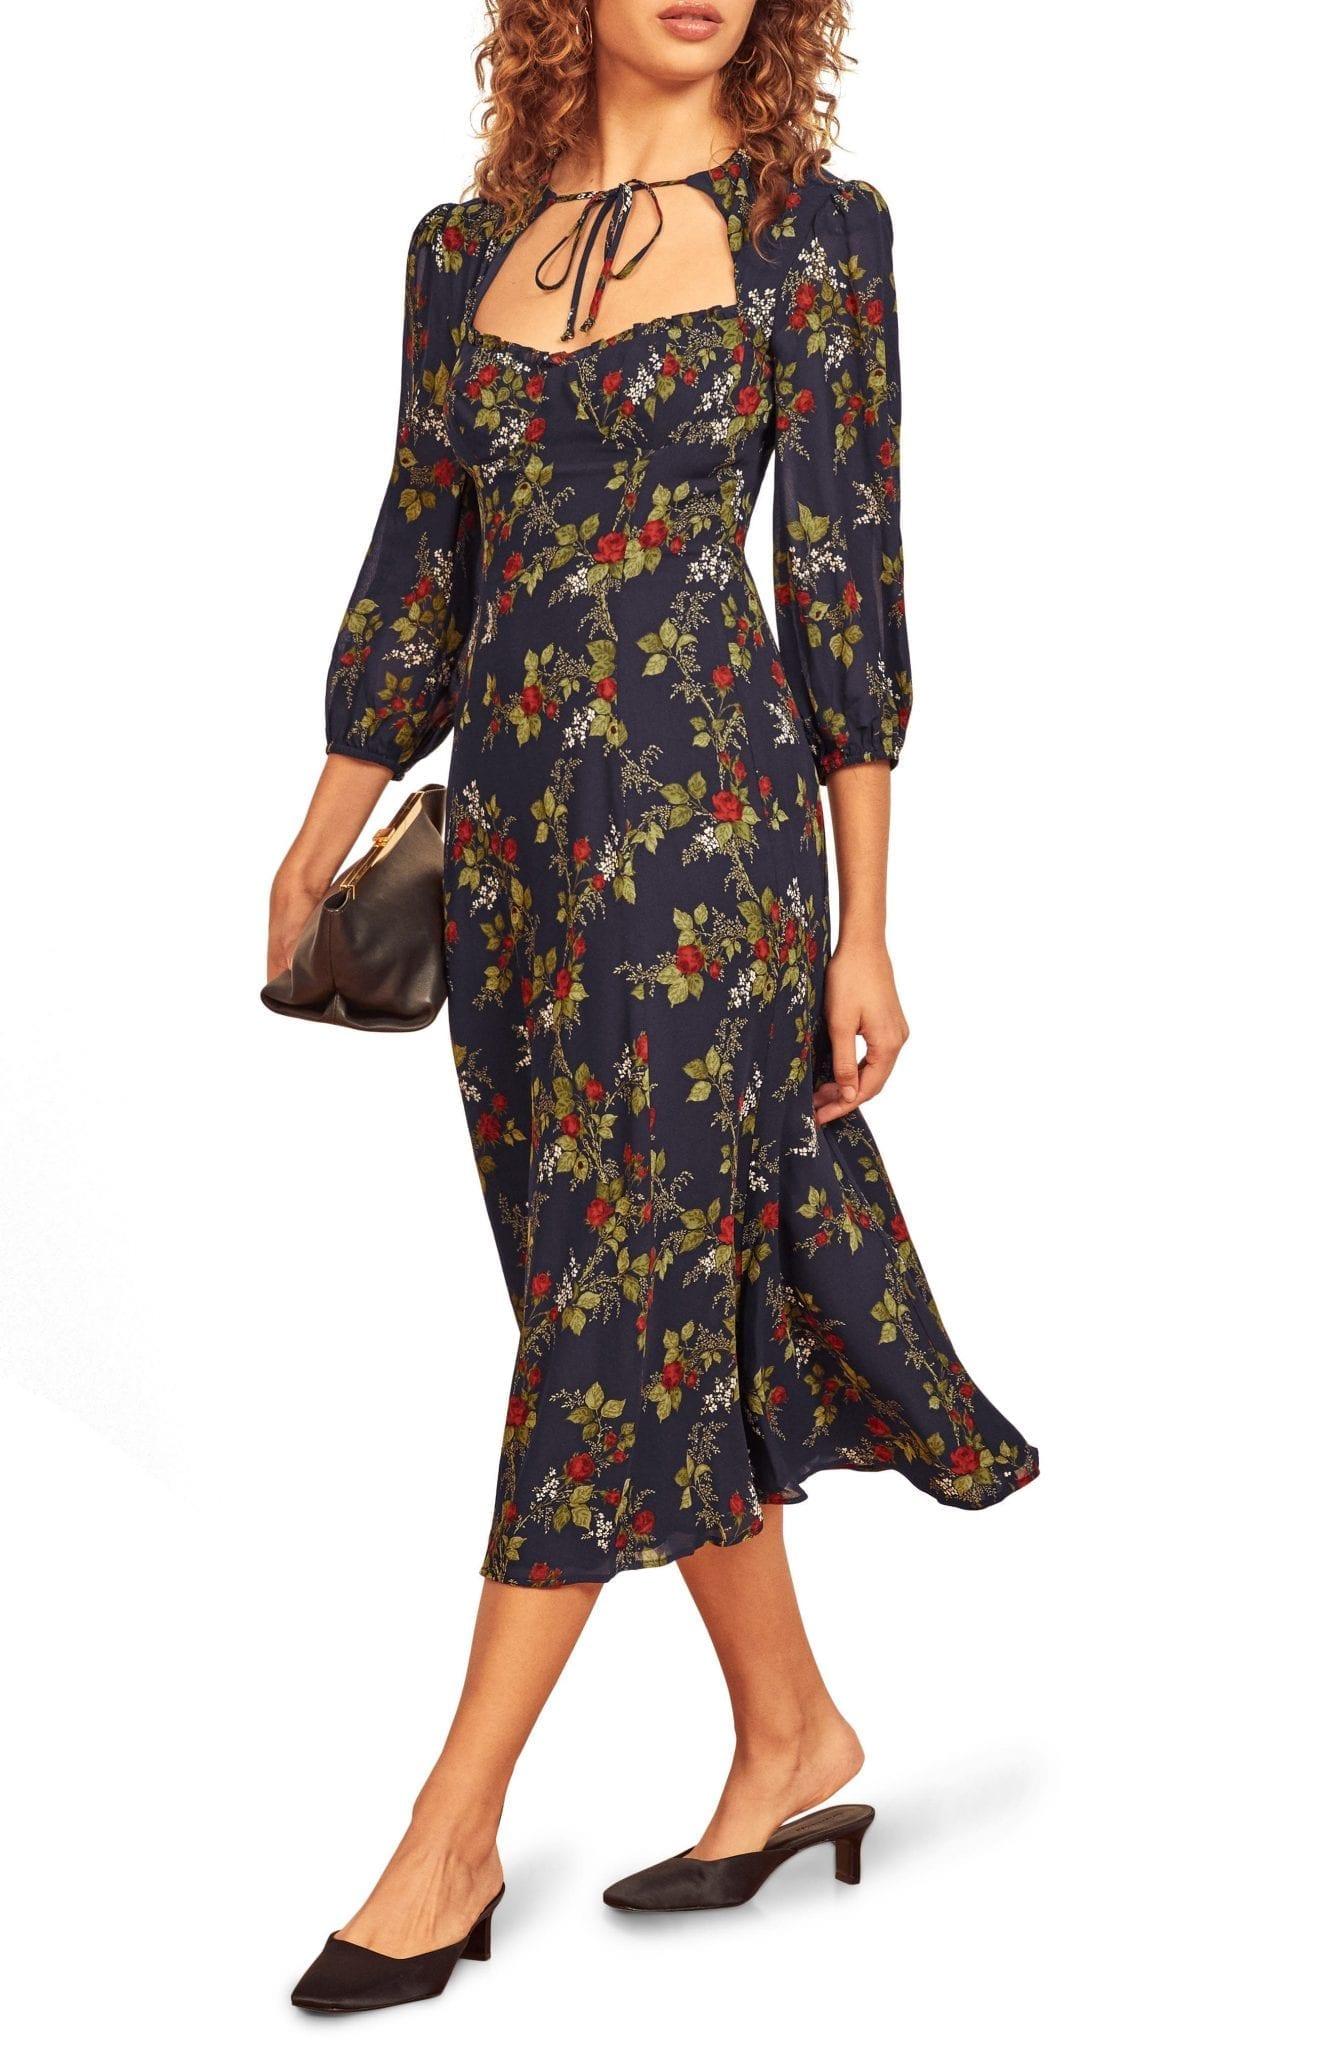 REFORMATION Poulter Floral Midi Dress